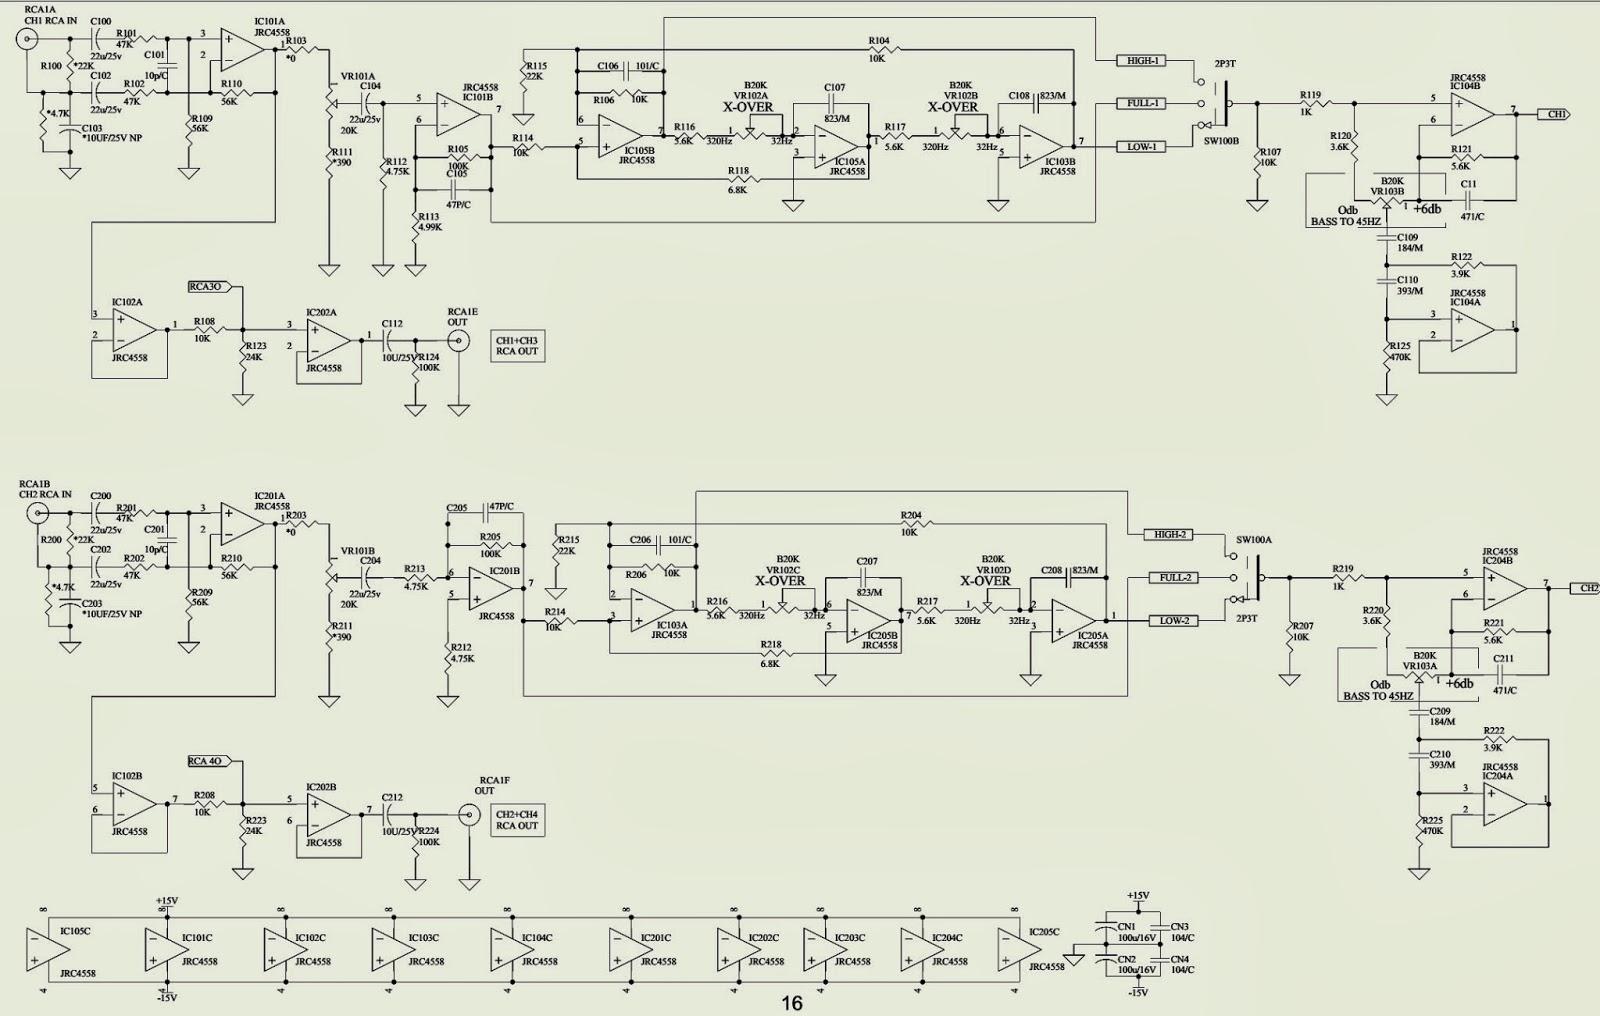 4 Channel Amp Wiring Diagram Car Stereo Harness Electro Help Jbl Cs 60 4channel Power Amplifier